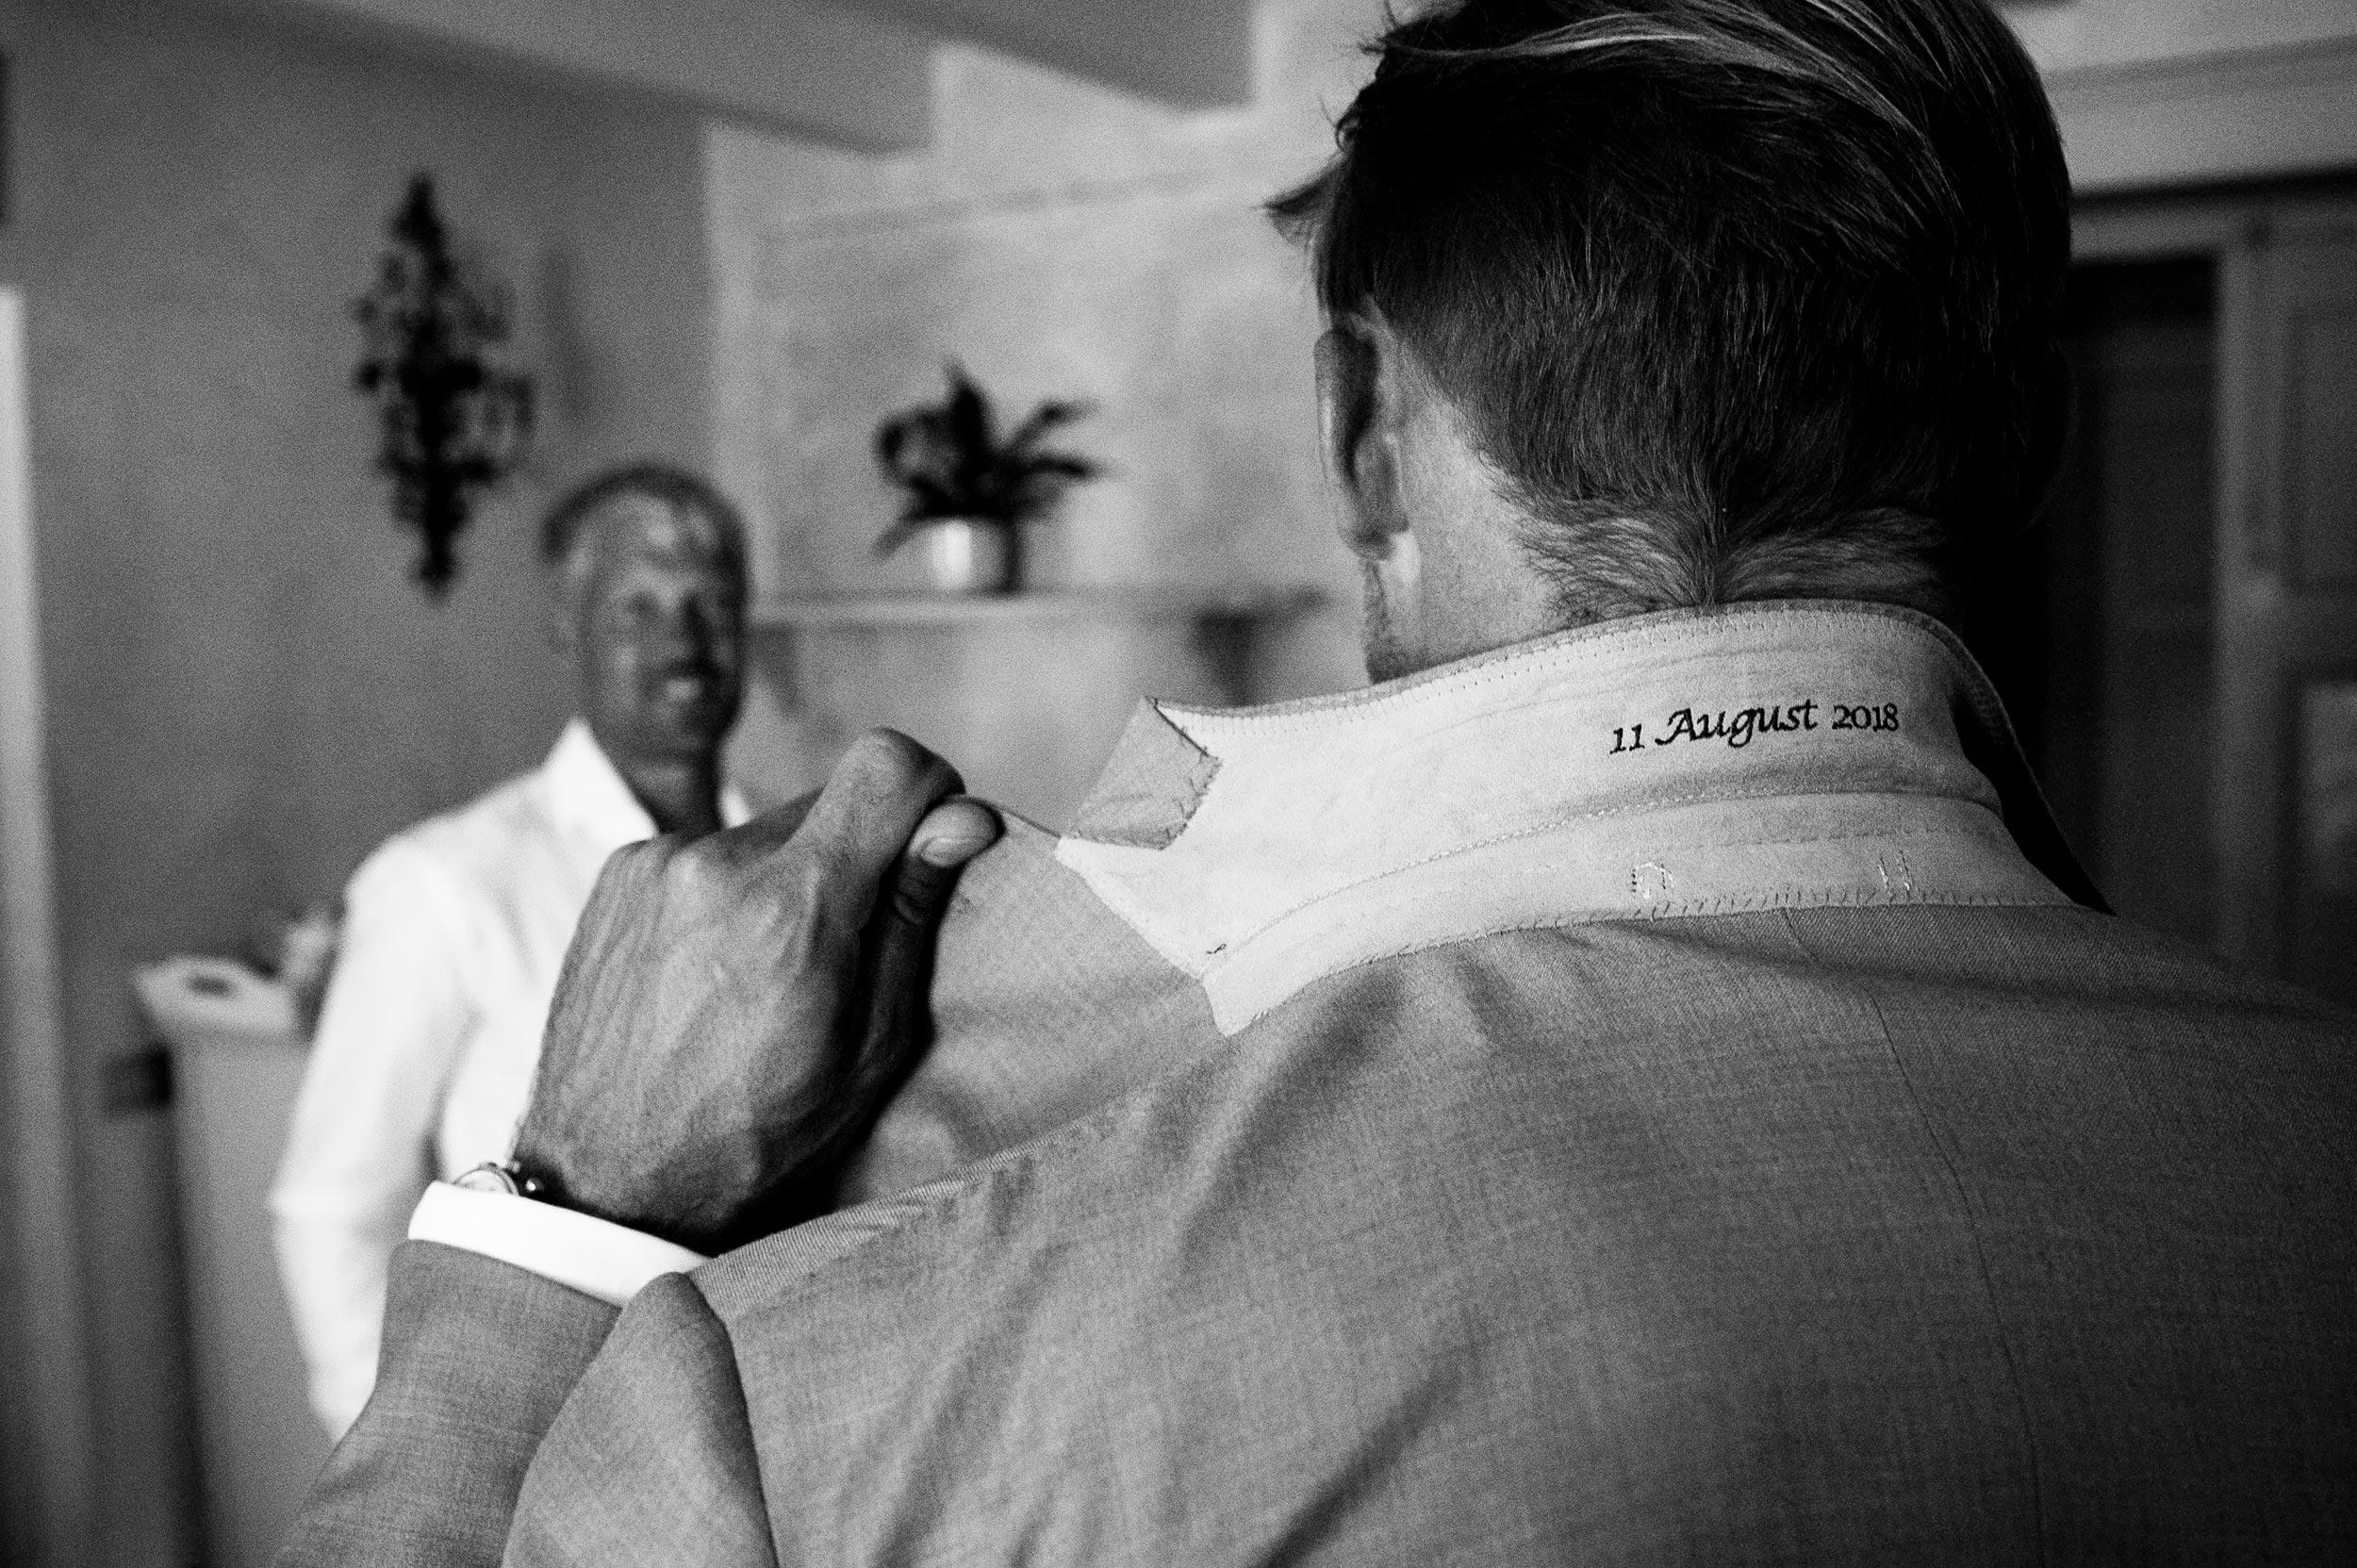 2018-Villa-Regina-Teodolinda-Lake-Como-Wedding-Photographer-Italy-Alessandro-Avenali-115.jpg